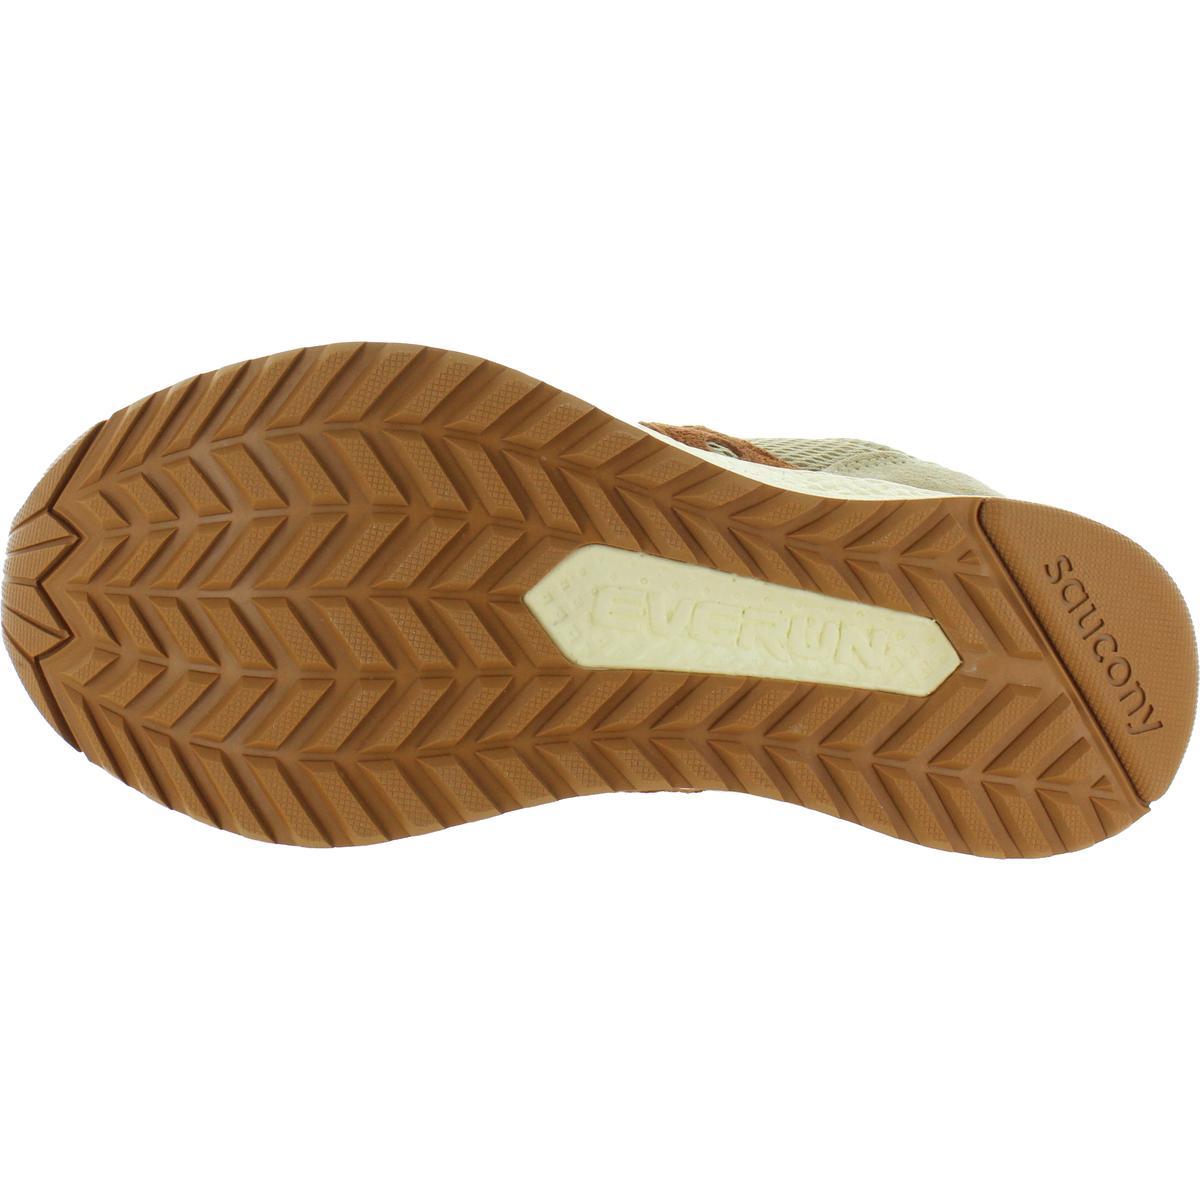 Saucony-Mens-Freedom-Runner-Tan-Running-Shoes-Sneakers-7-Medium-D-BHFO-4411 thumbnail 6